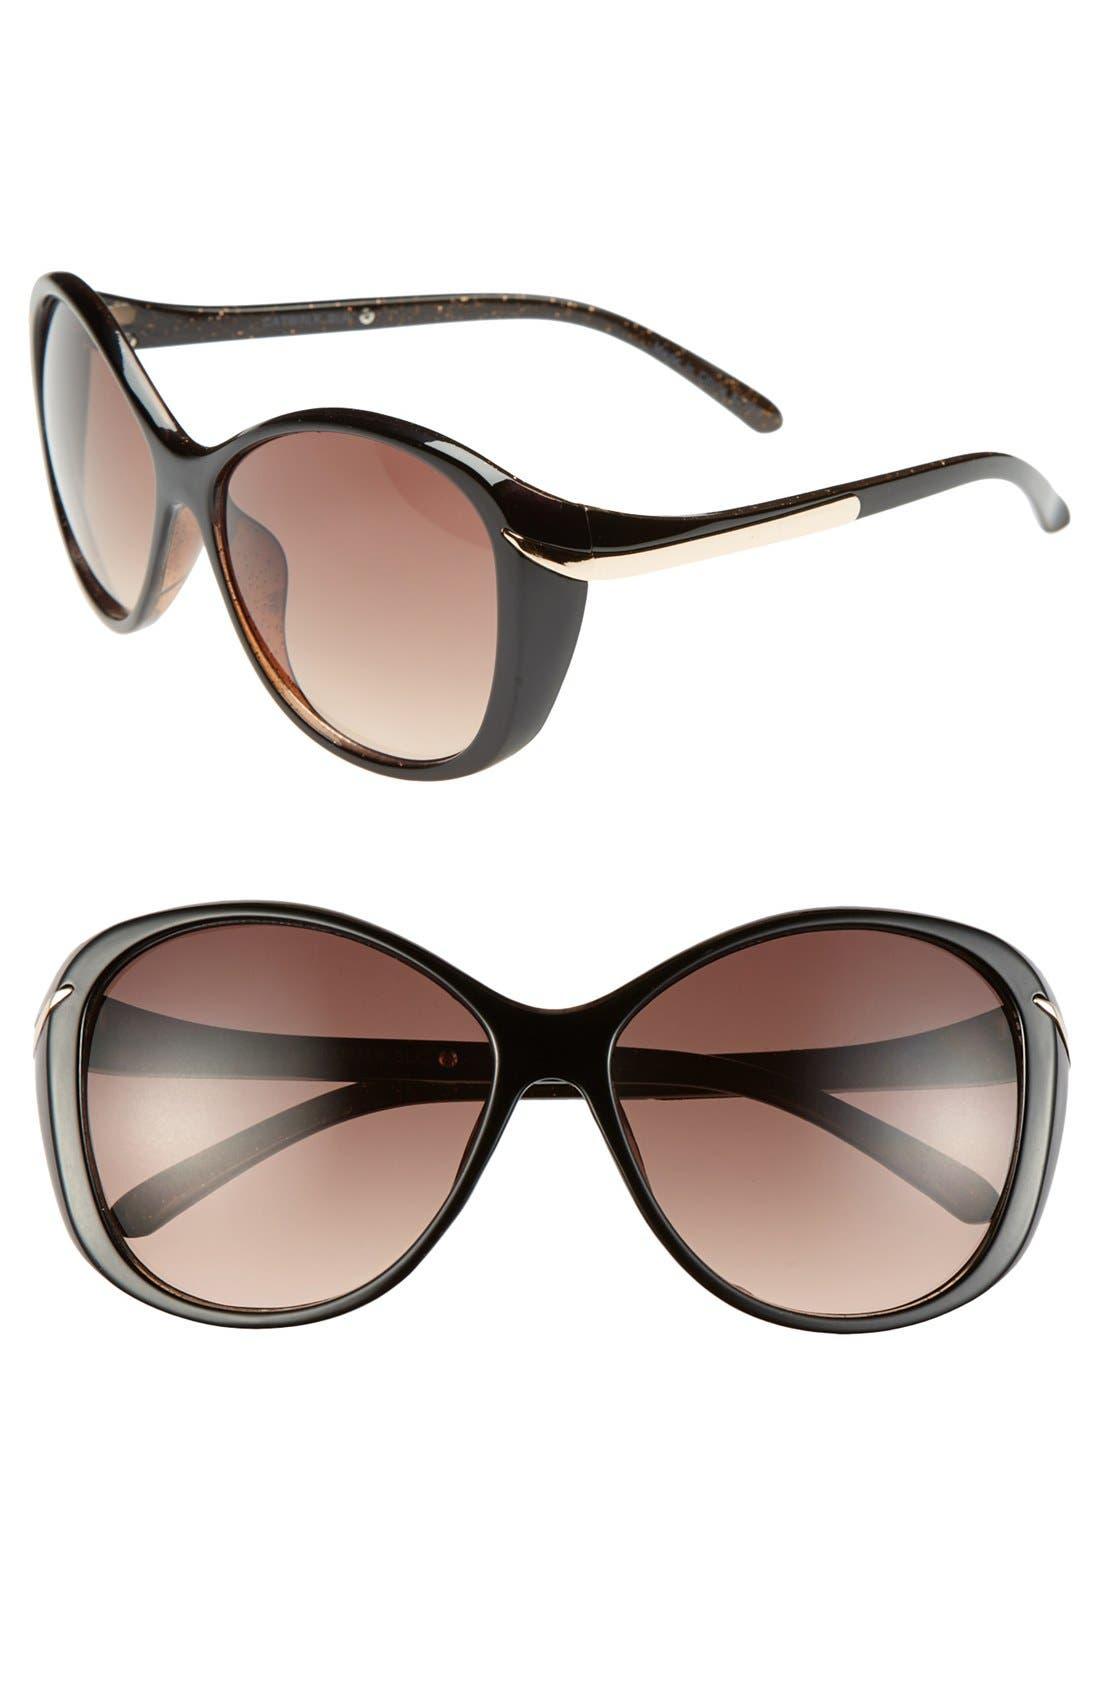 Main Image - Outlook Eyewear 'Catwalk' 56mm Sunglasses